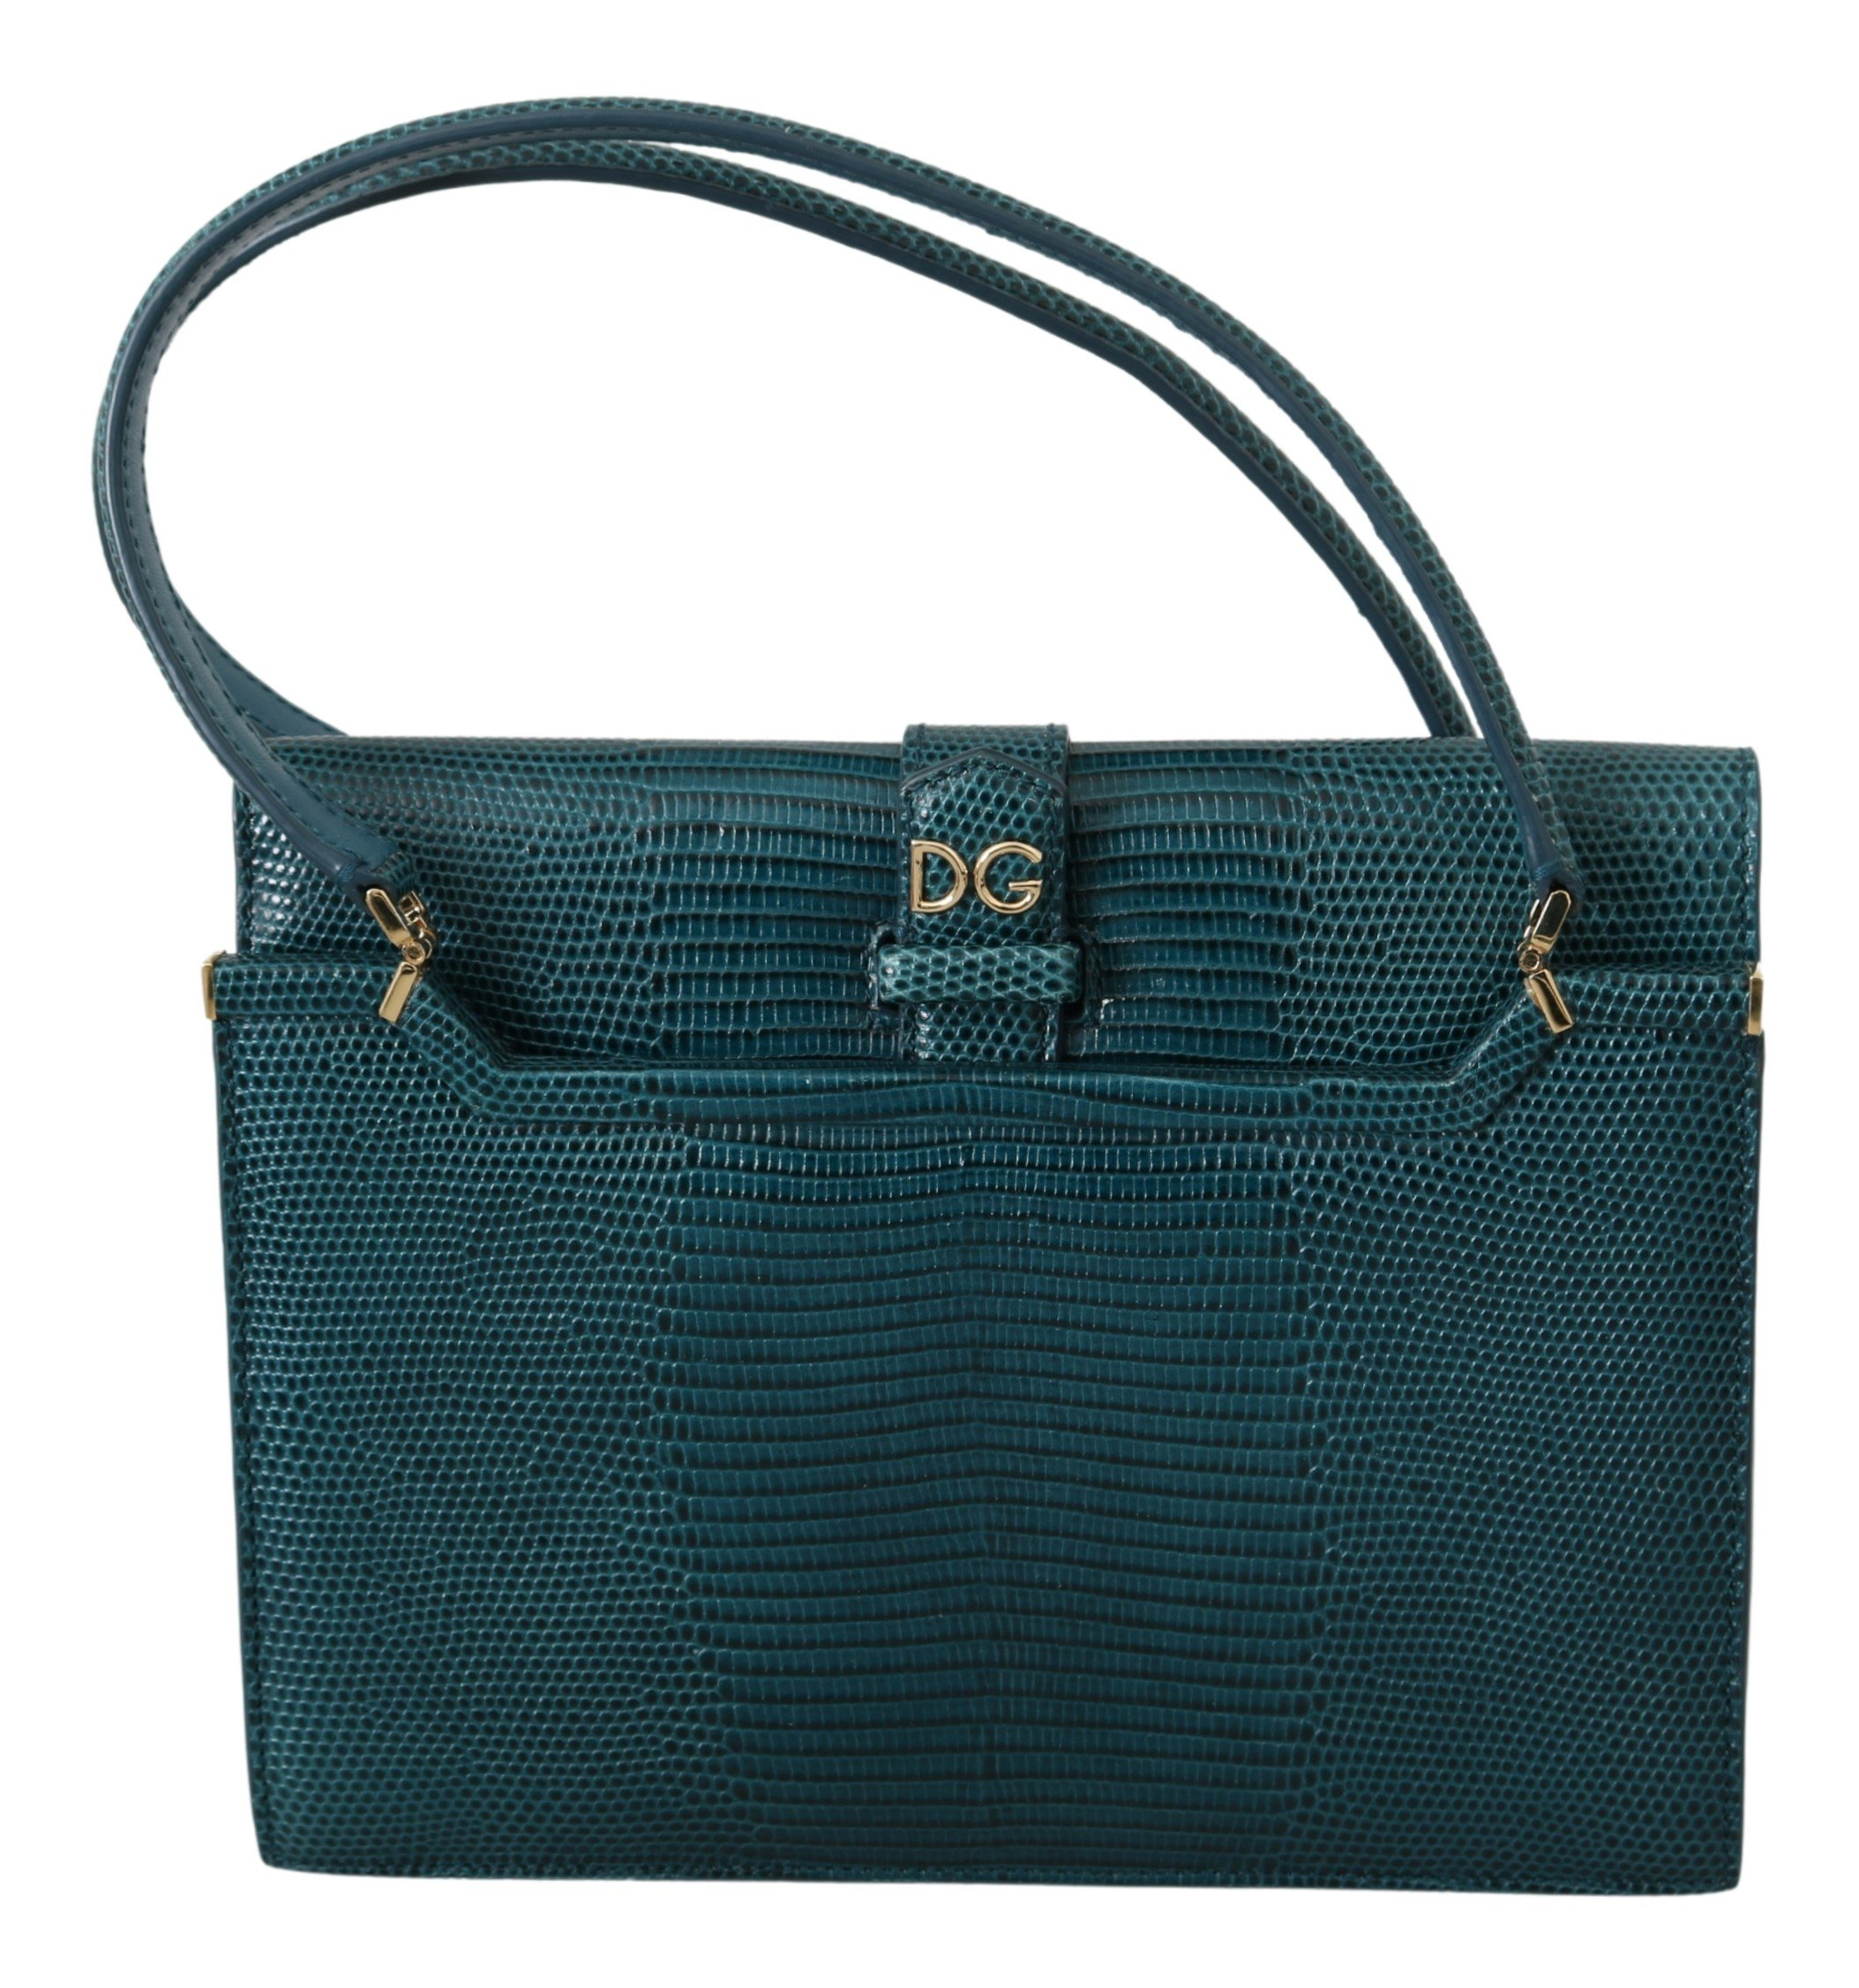 Dolce & Gabbana Women's Iguana Calfskin Leather Handbag Blue VAS9766